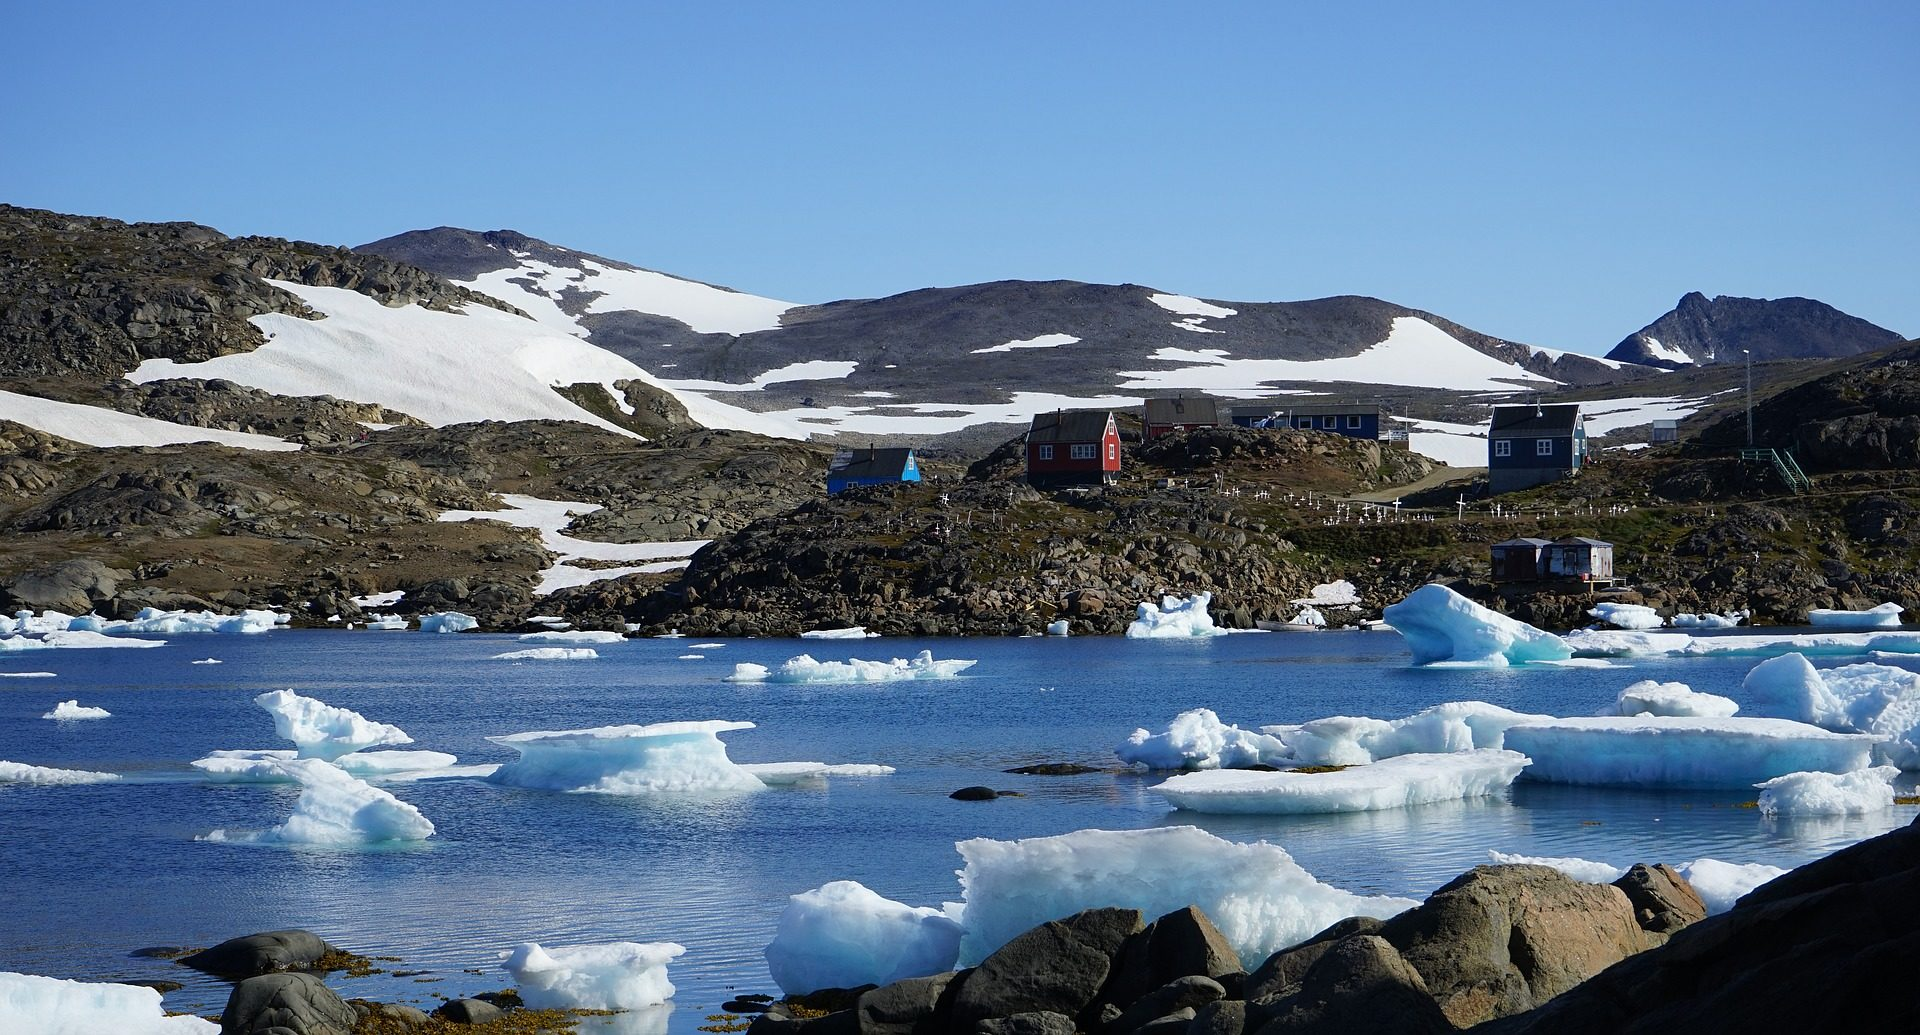 glace, froide, icebergs, Mer, Montañas, Arctique, Fjord, Groenland - Fonds d'écran HD - Professor-falken.com